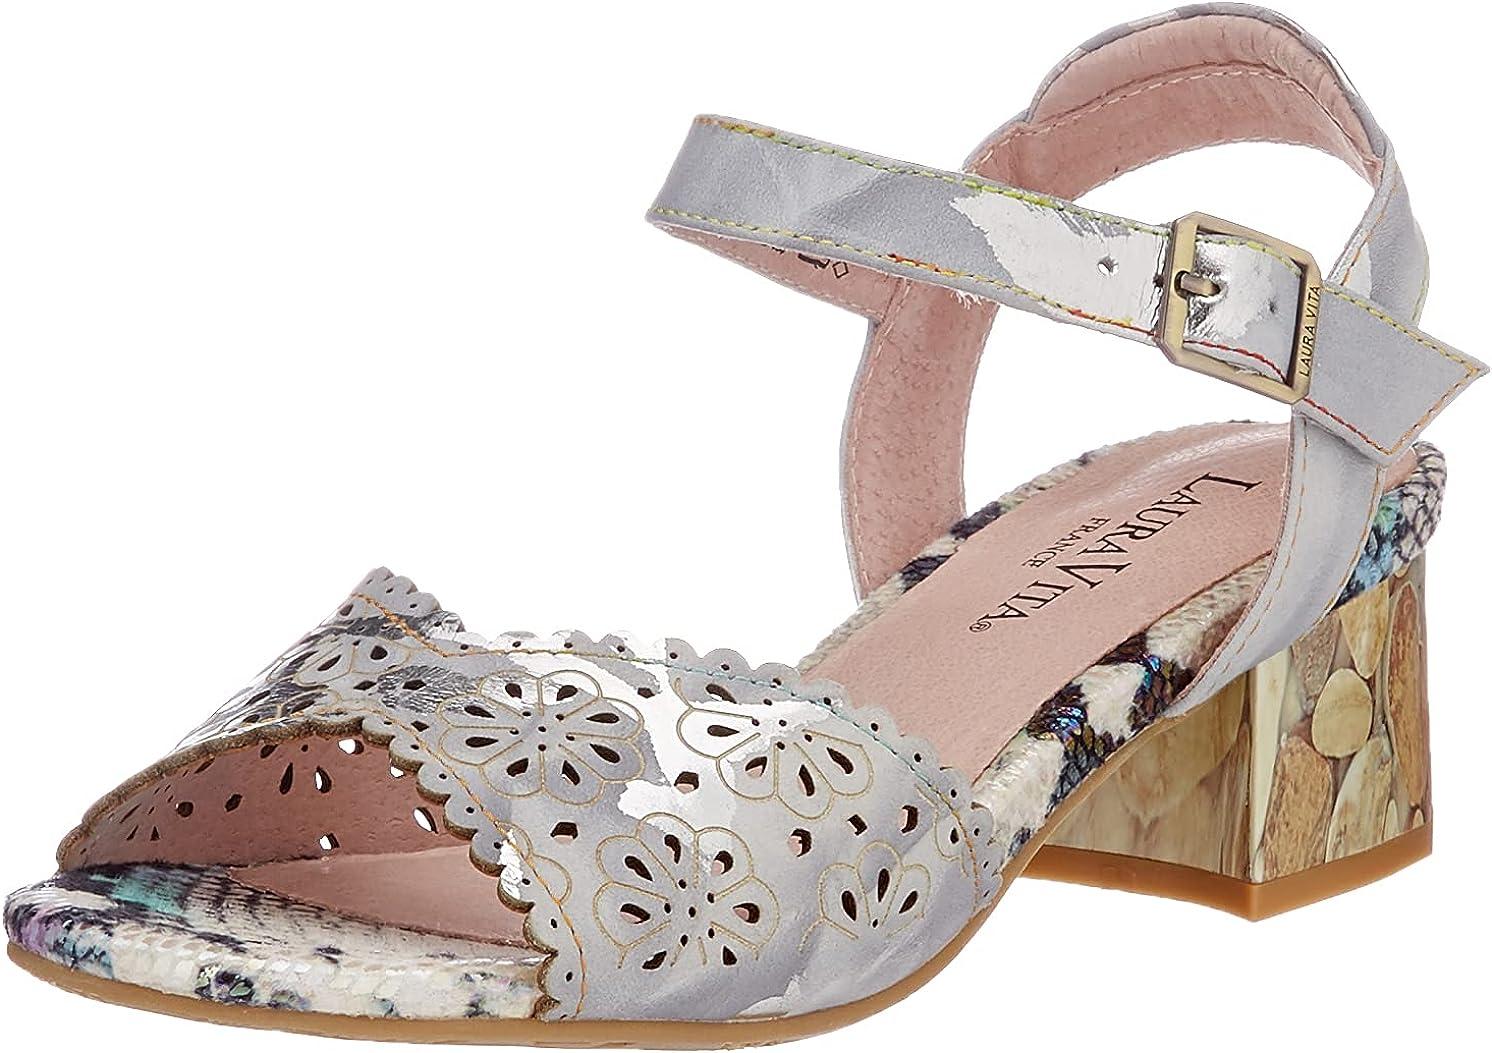 Laura Vita Women's Heeled Popular brand in the world 5 ☆ very popular Sandal T-Strap.